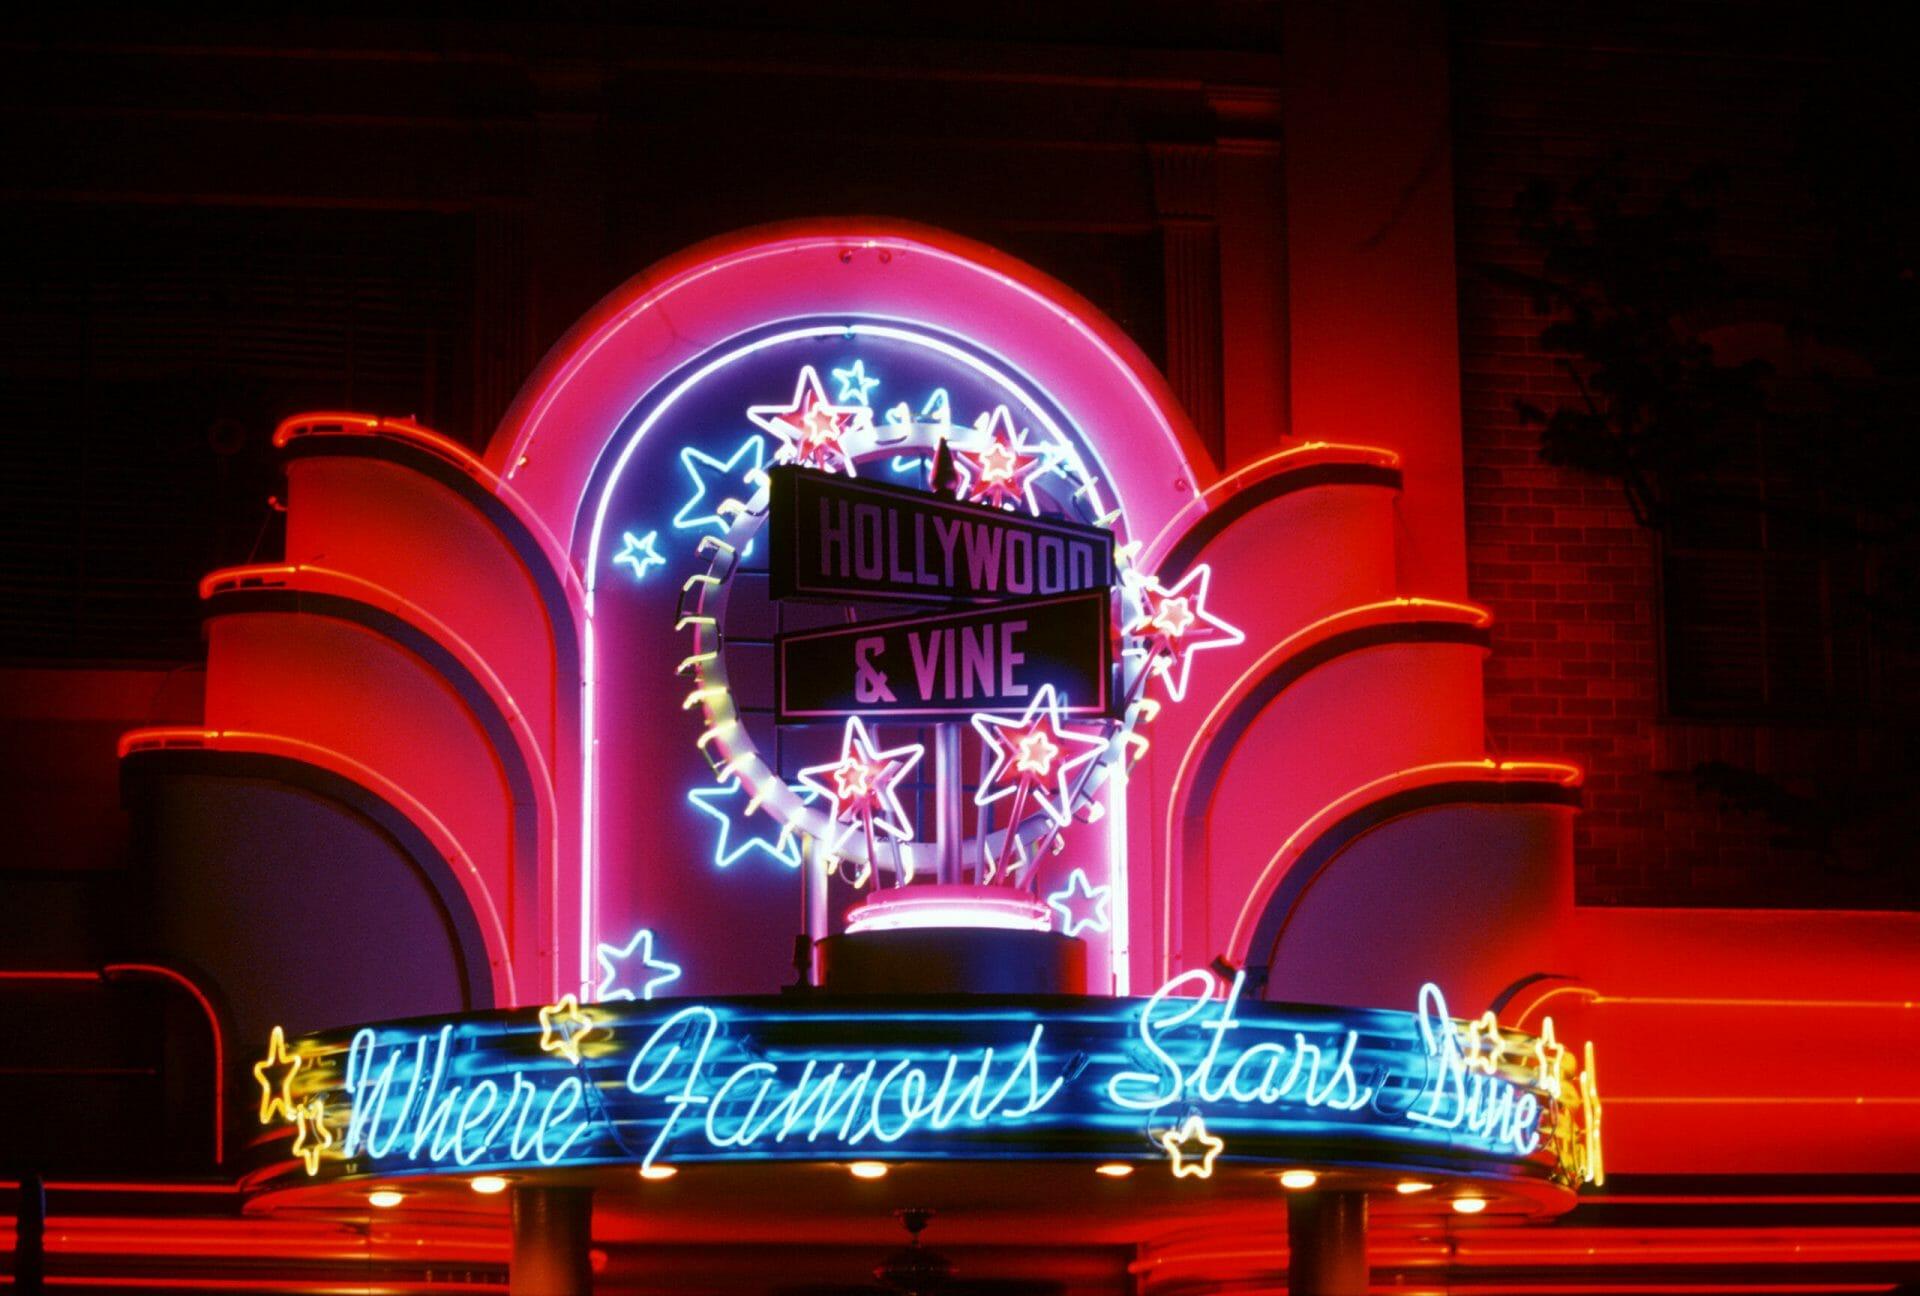 Hollywood & Vine Restaurant at Disney's Hollywood Studios